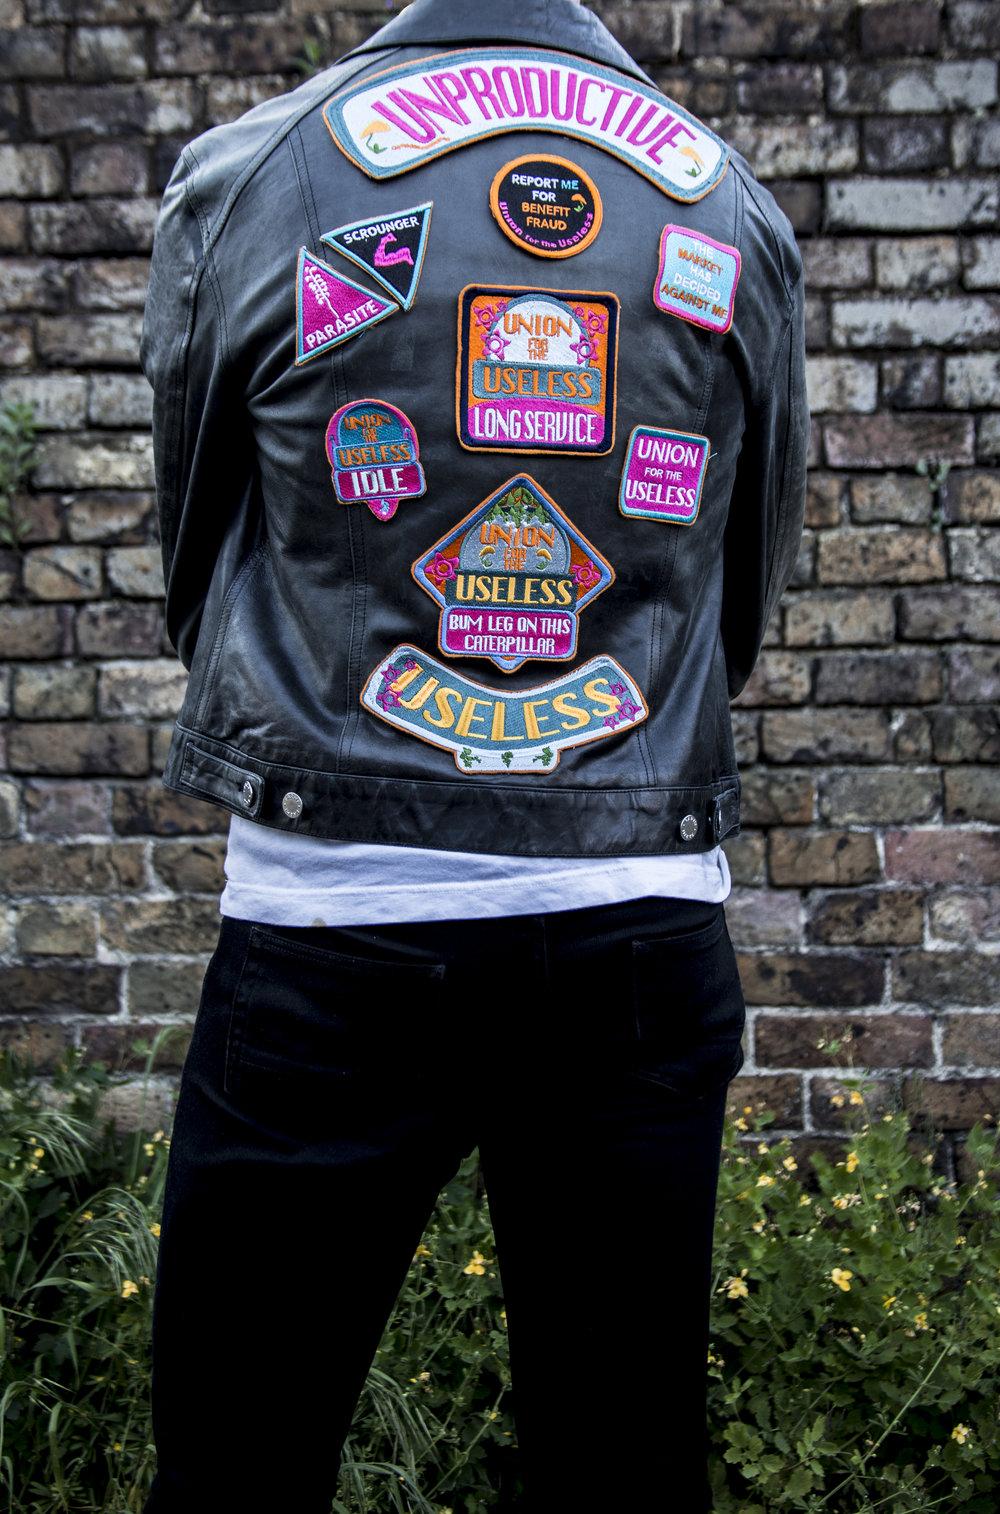 Useless Leather Jacket.jpg